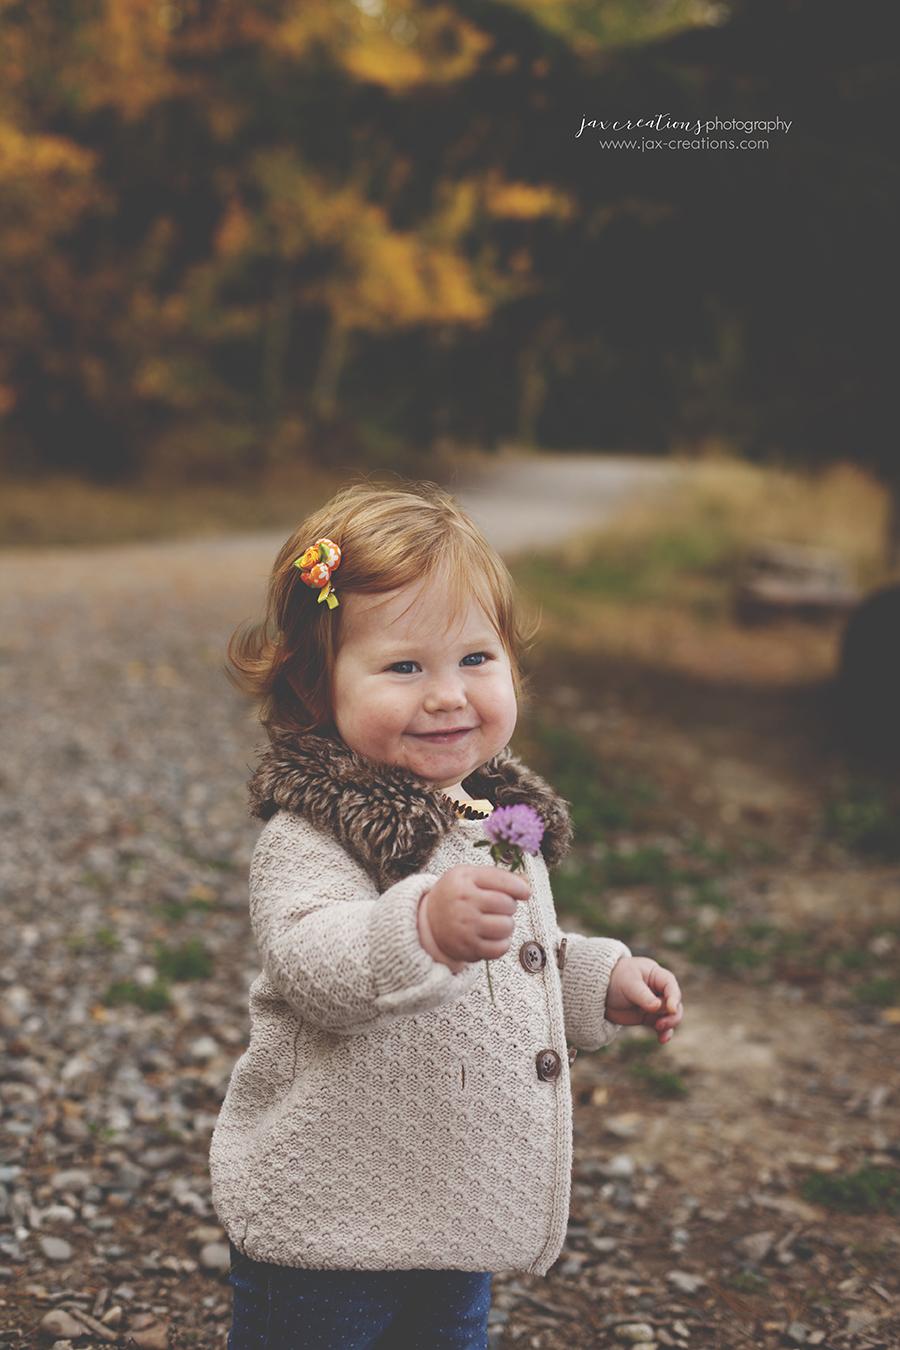 Jax Creations Photography, child photographer, sandpoint idaho, coeur d alene idaho, family, baby, toddler, family photographer